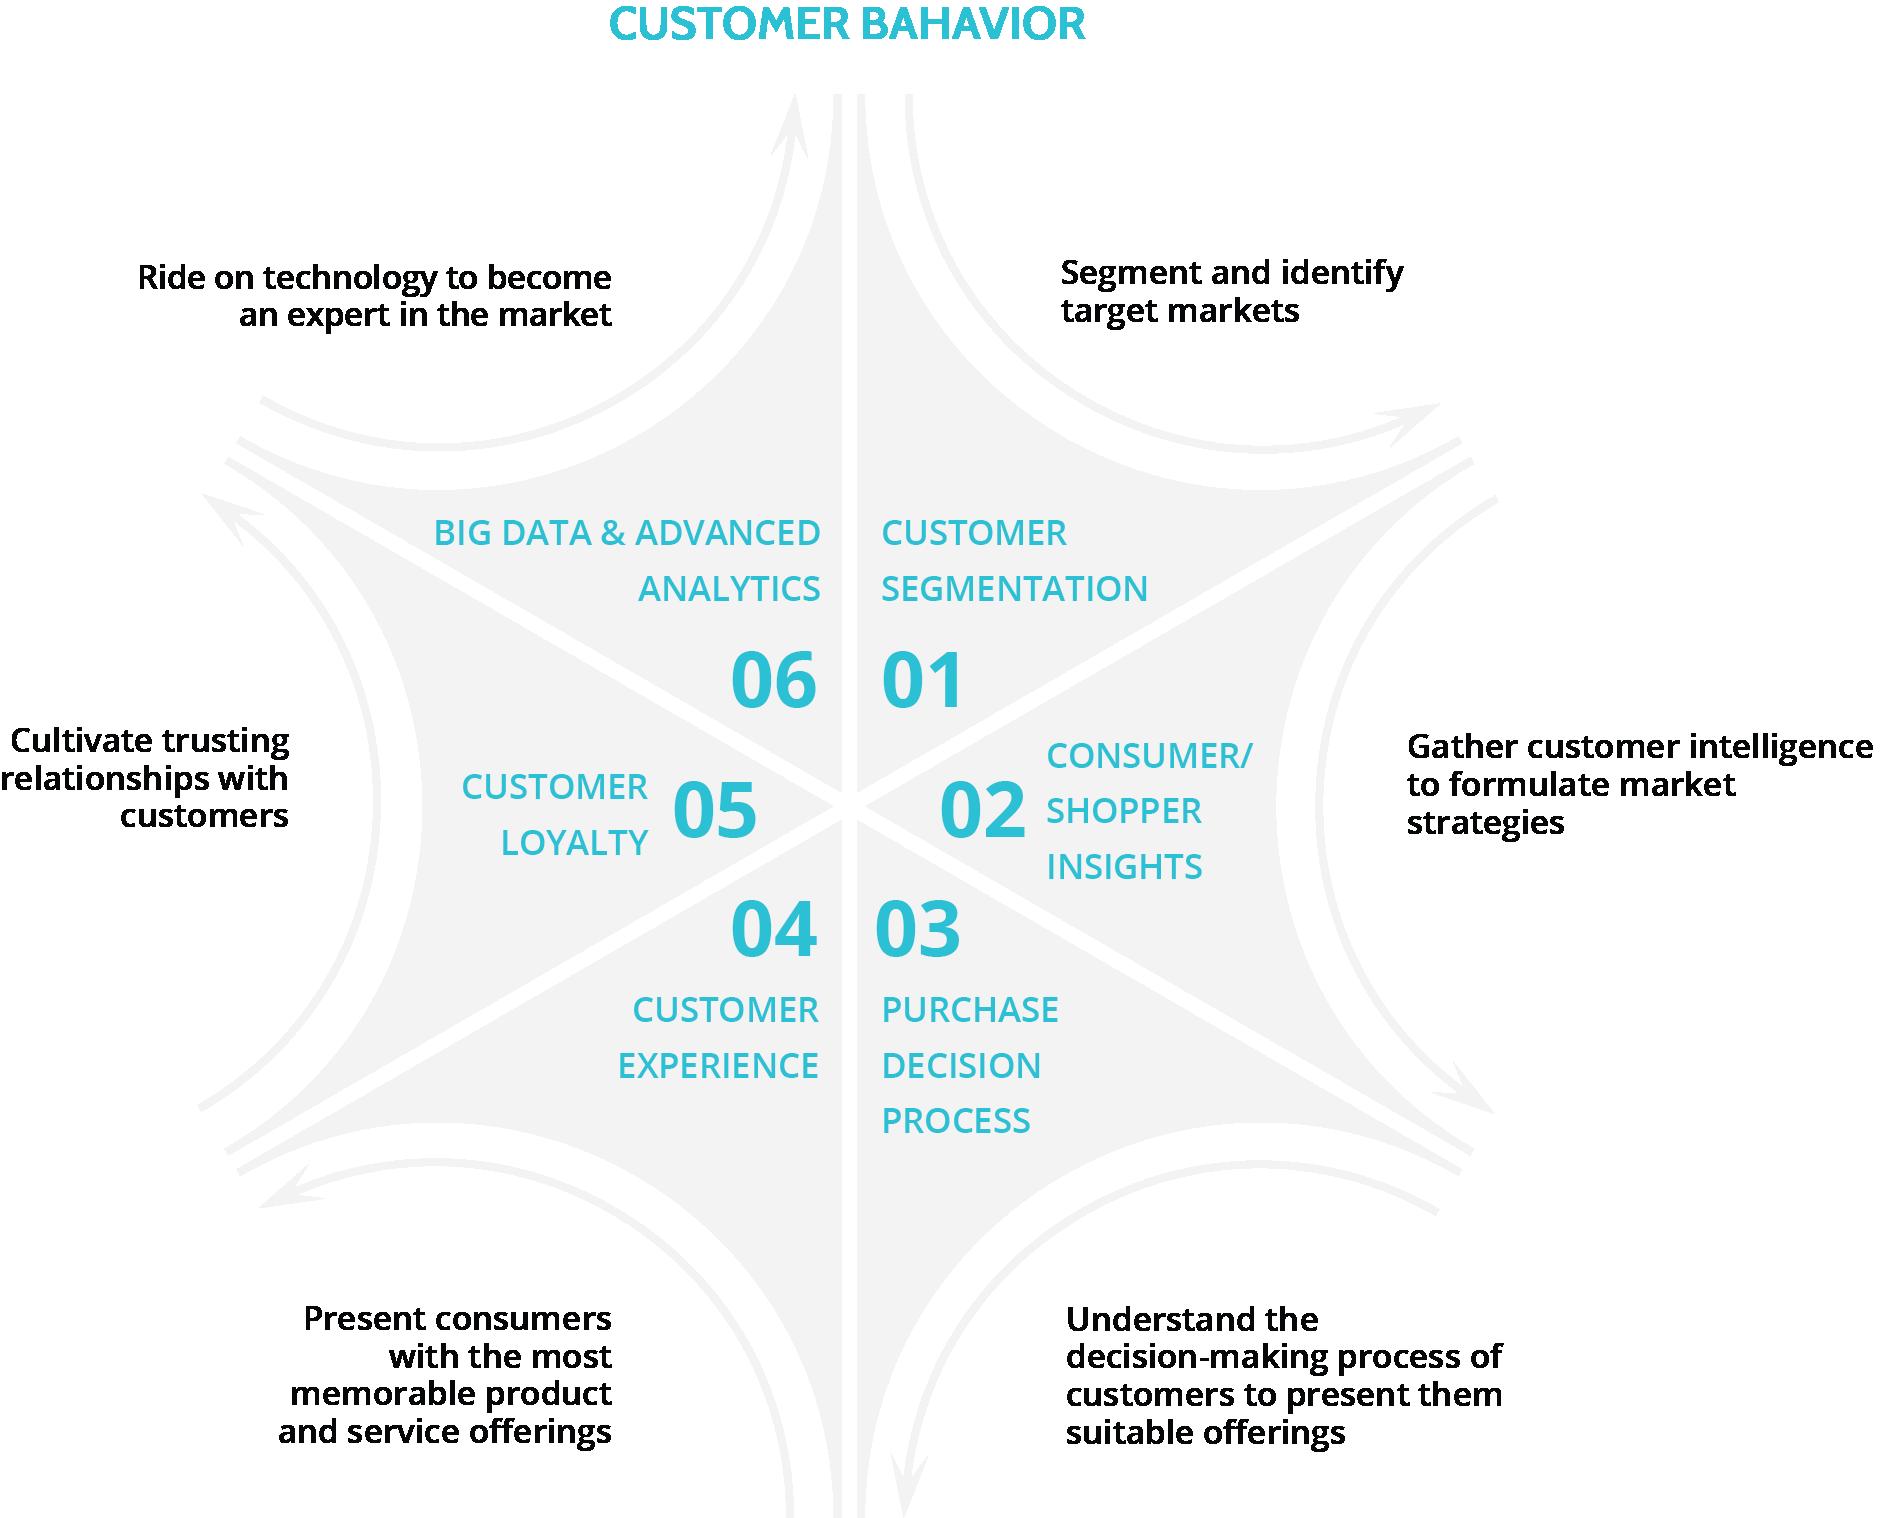 Key elements of customer behavior